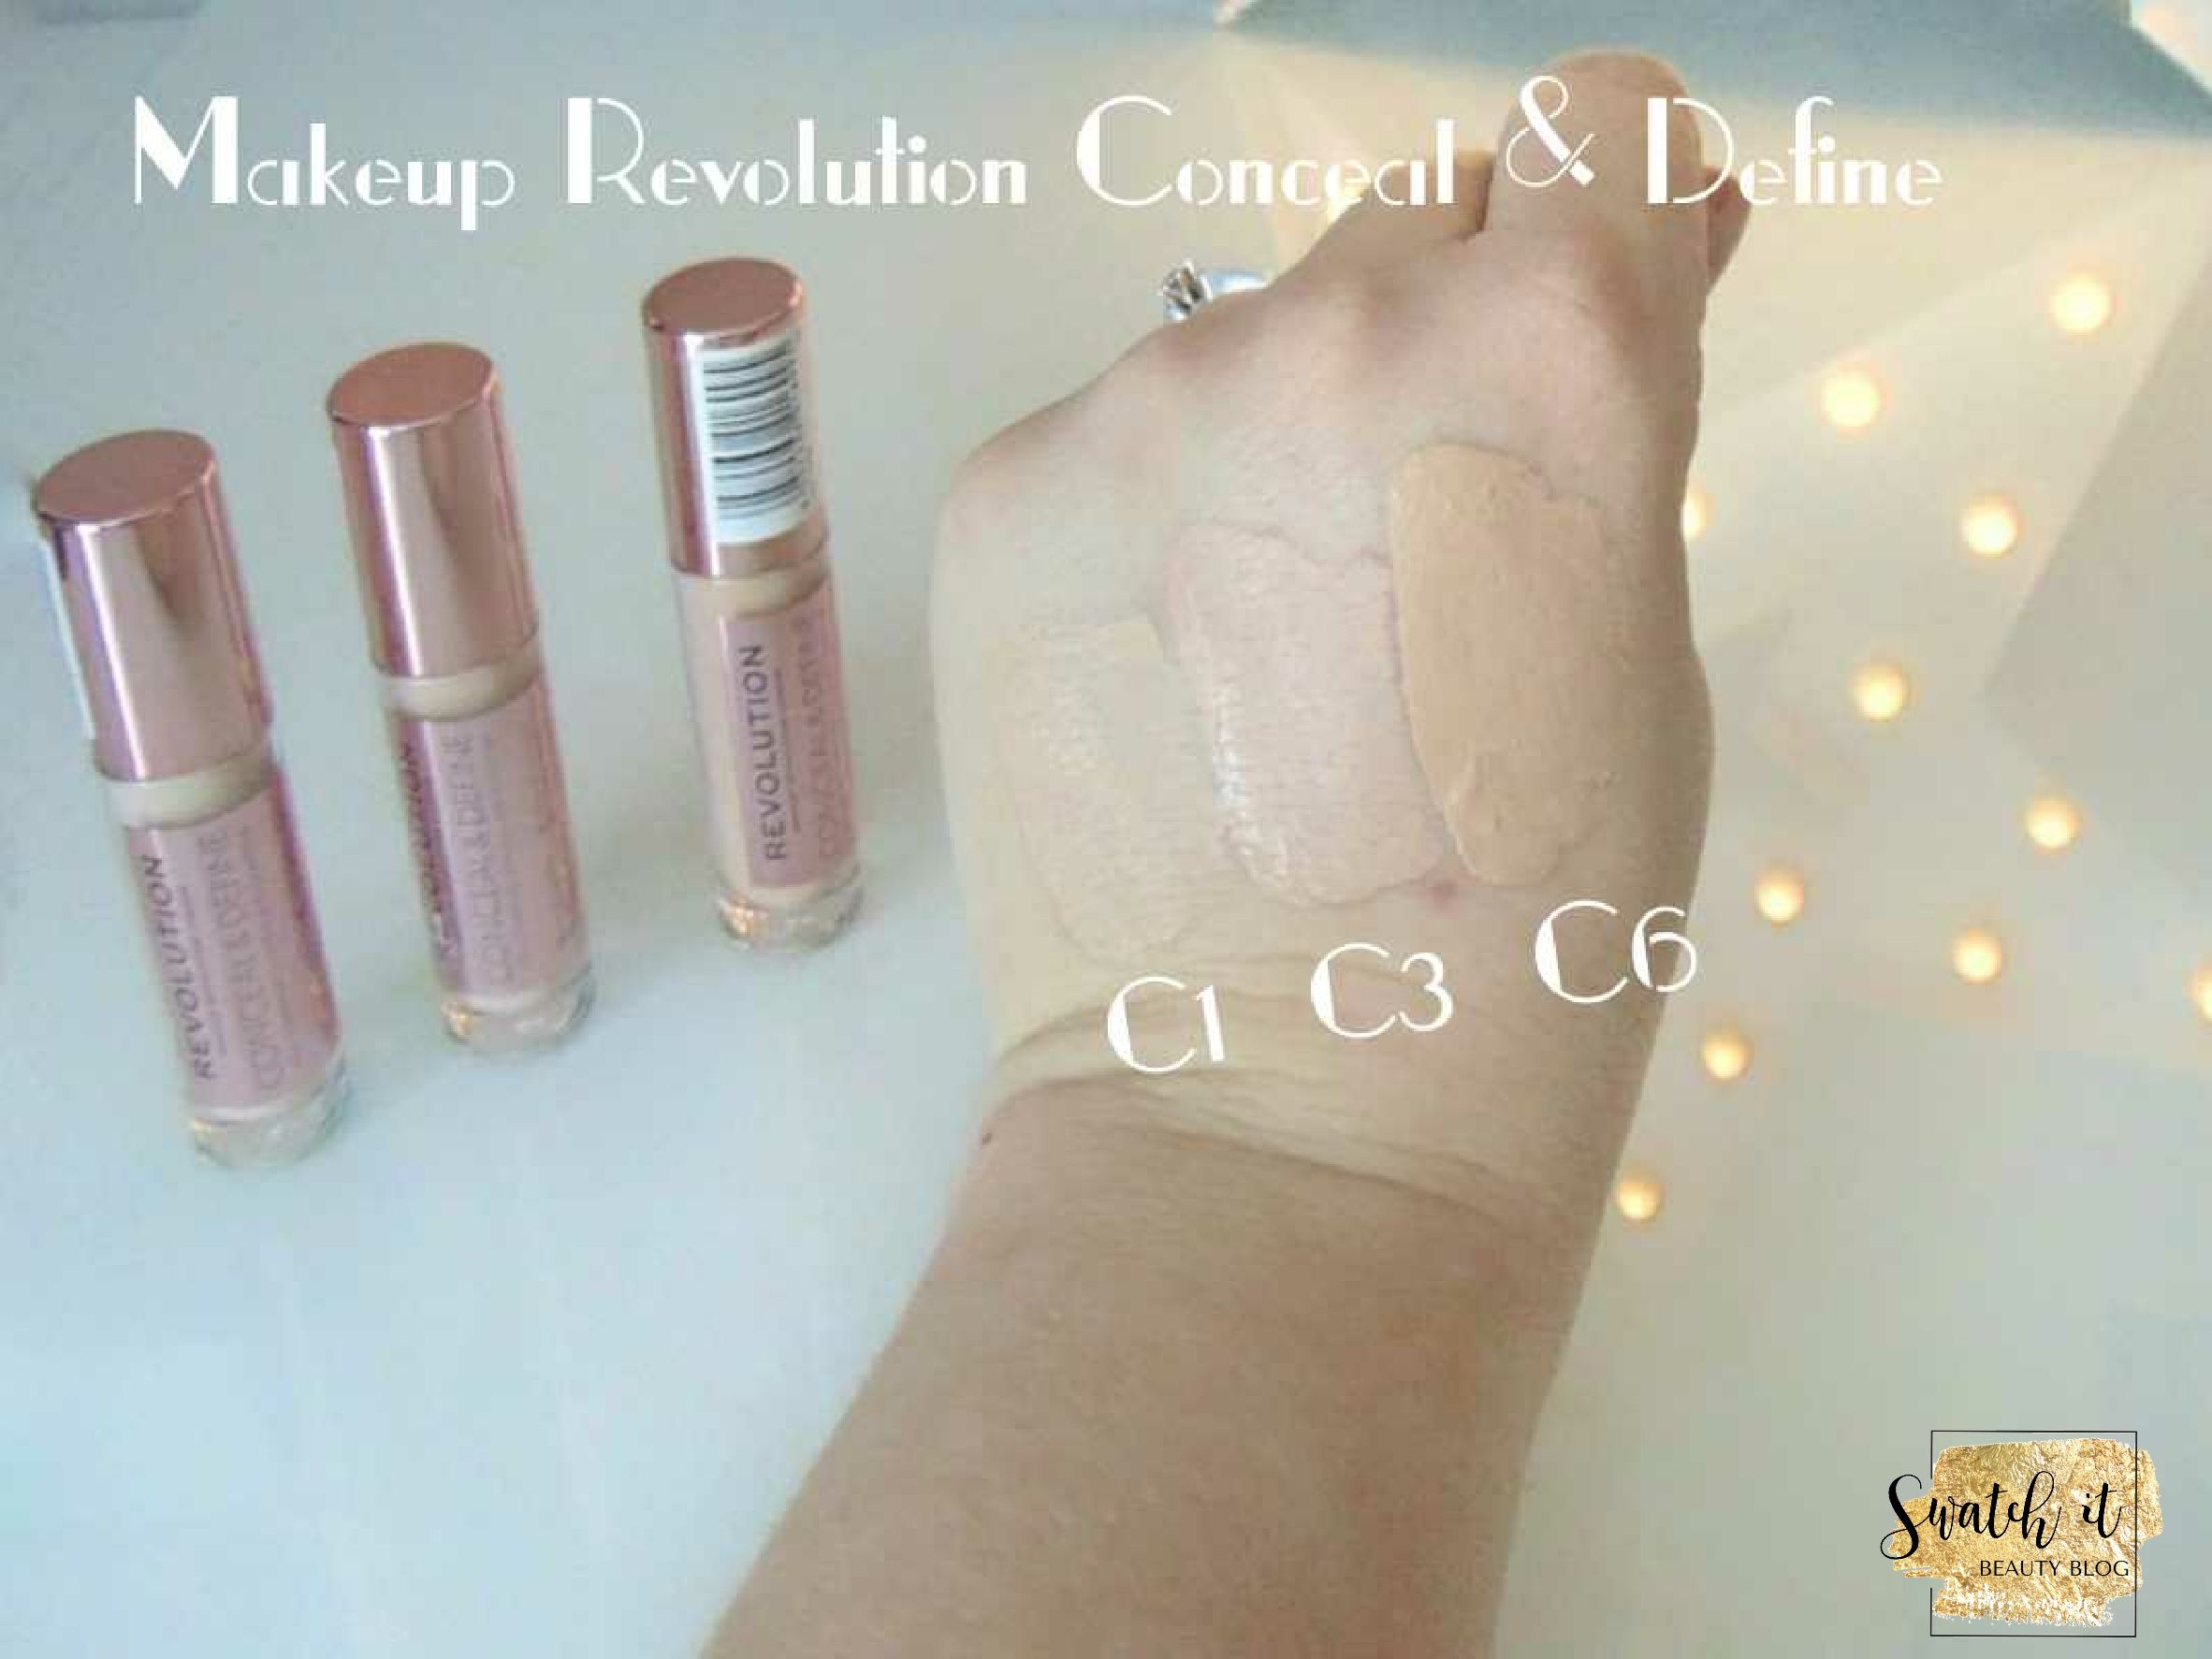 Makeup Revolution Conceal & Define Concealer C1, C3, C6